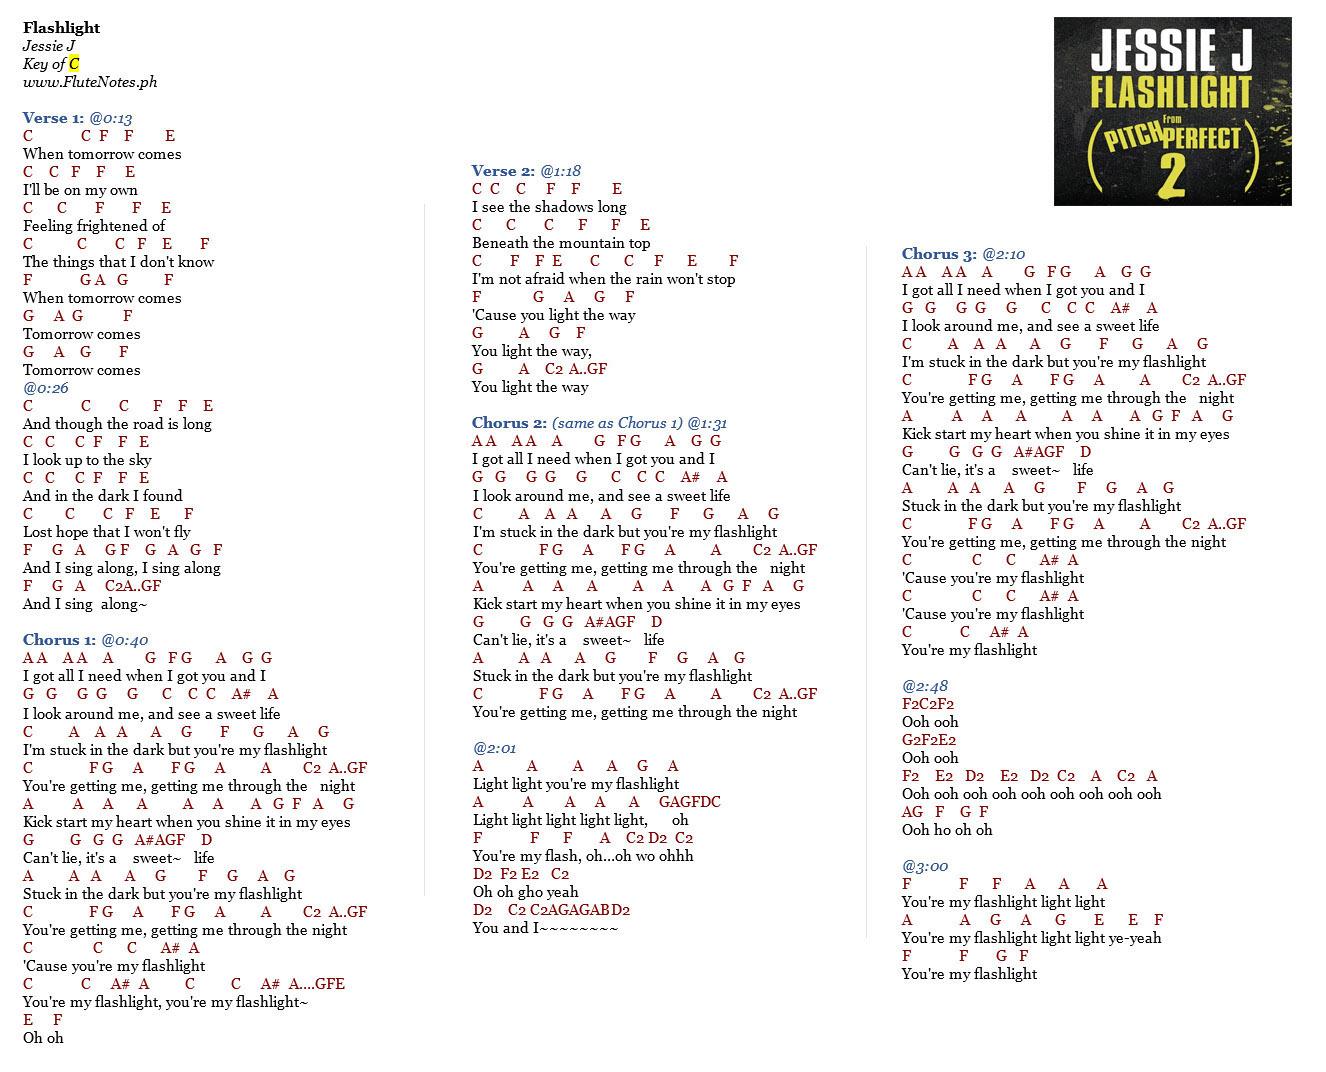 Flashlight - Jessie J | Music Letter Notation with Lyrics for Flute